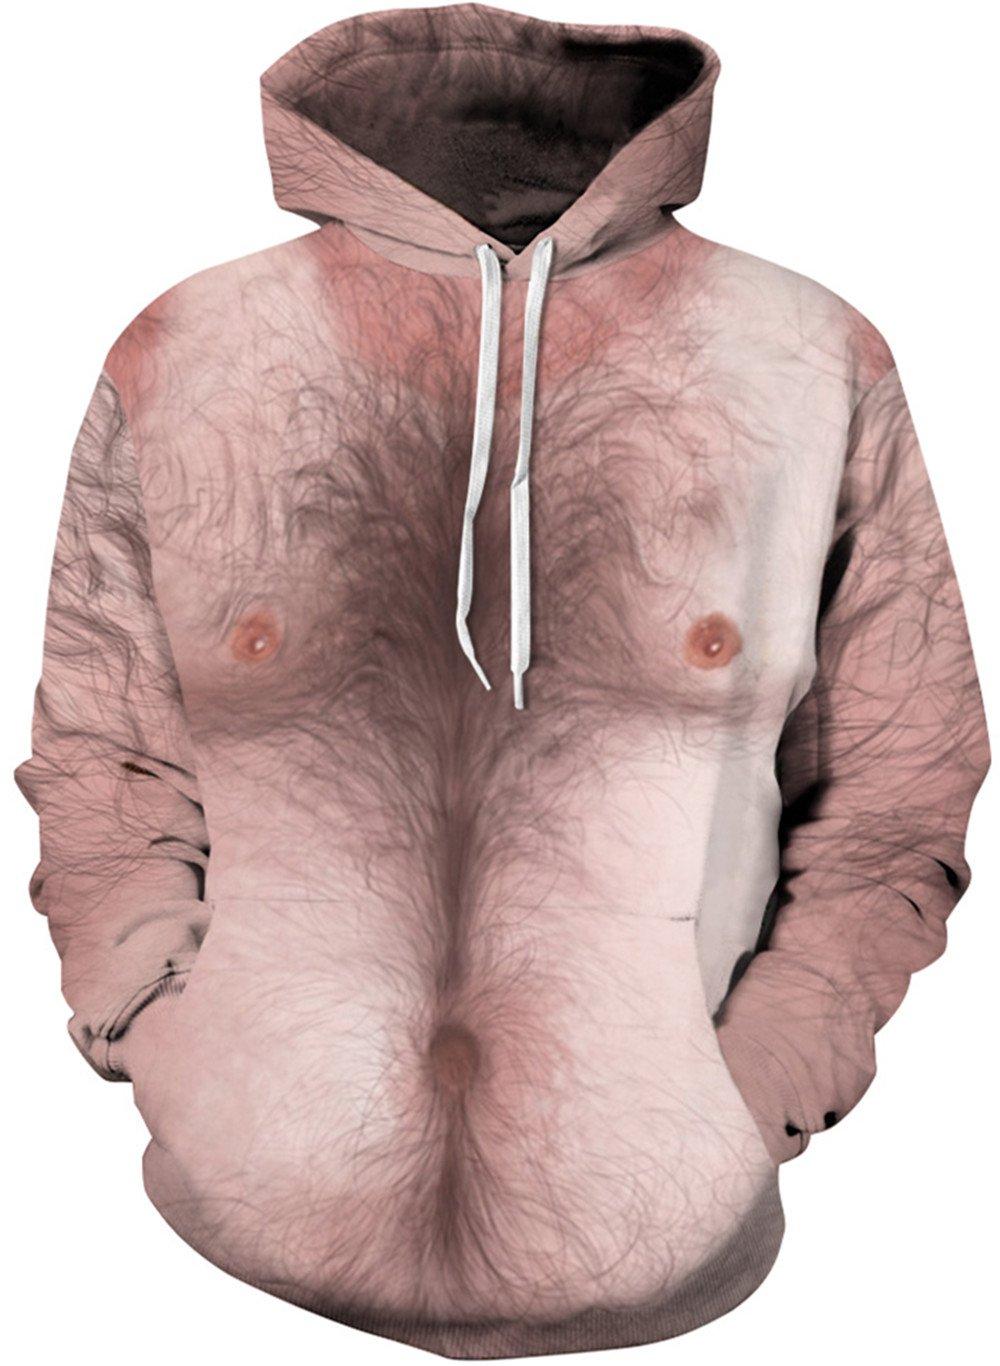 Imbry Unisex 3D Animal Print Pullover Hoodies Sweatshirts CMSTCQYDM